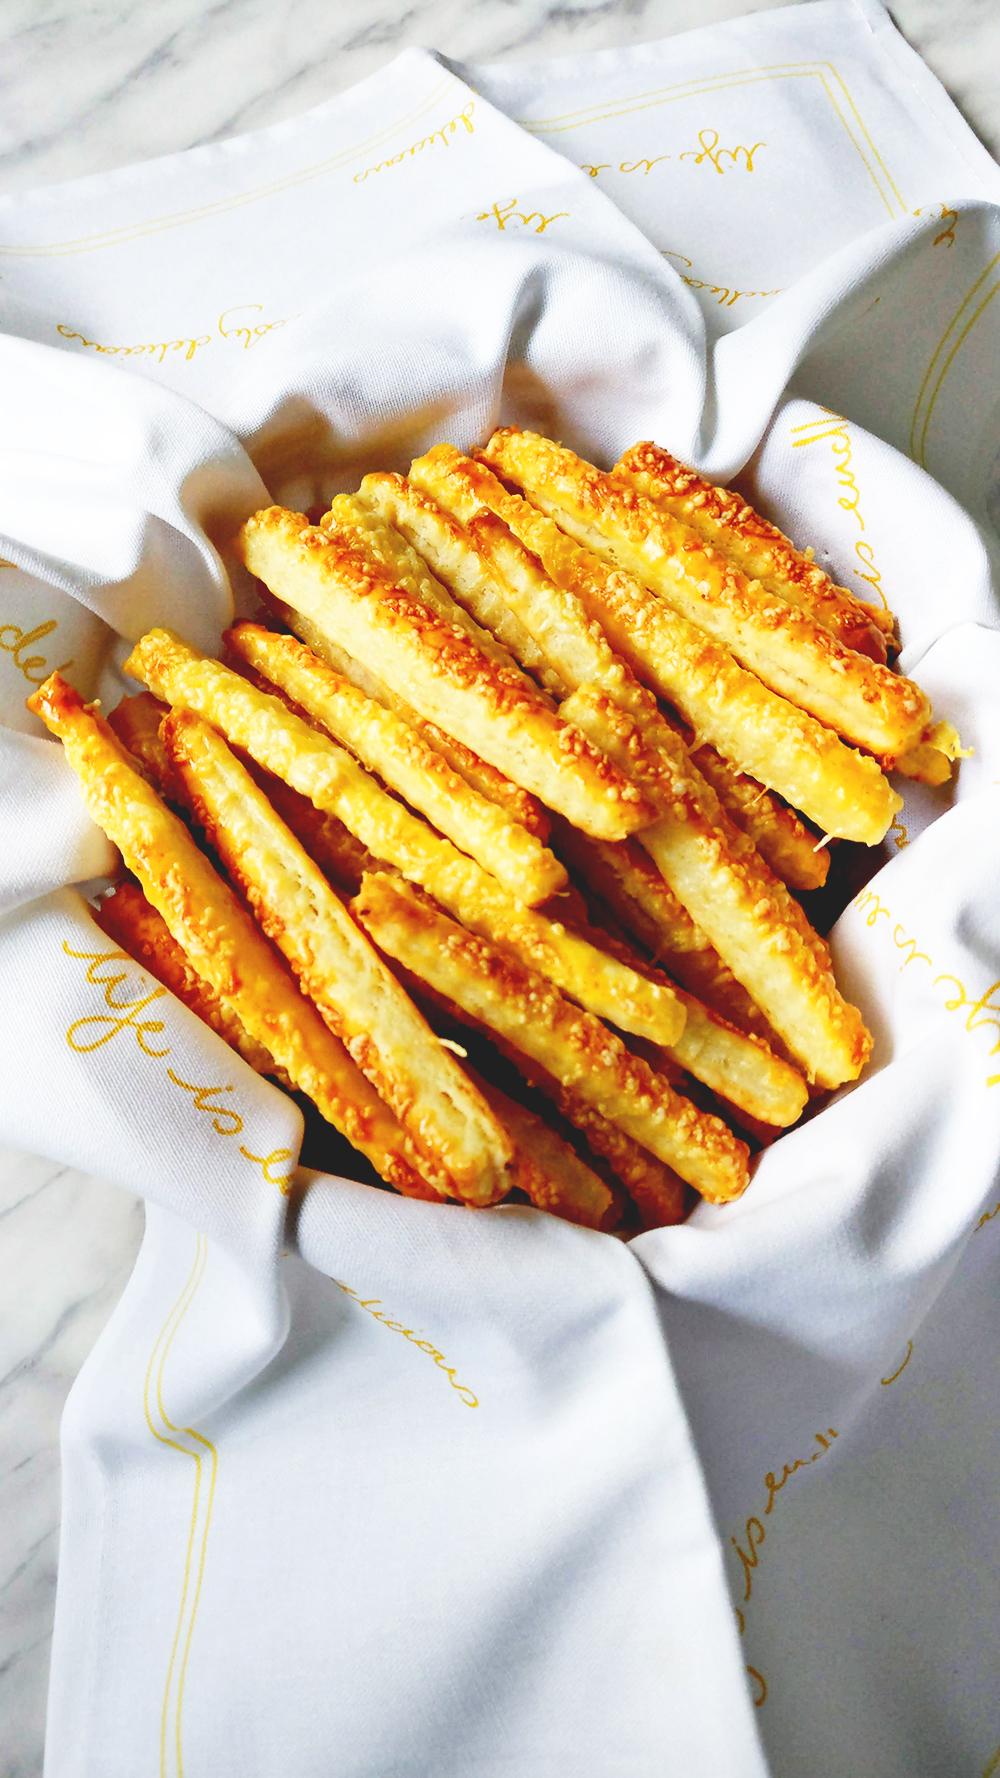 Cheesy salty sticks from 5 ingredients | Aliz's Wonderland #recipe #snack #saltystick